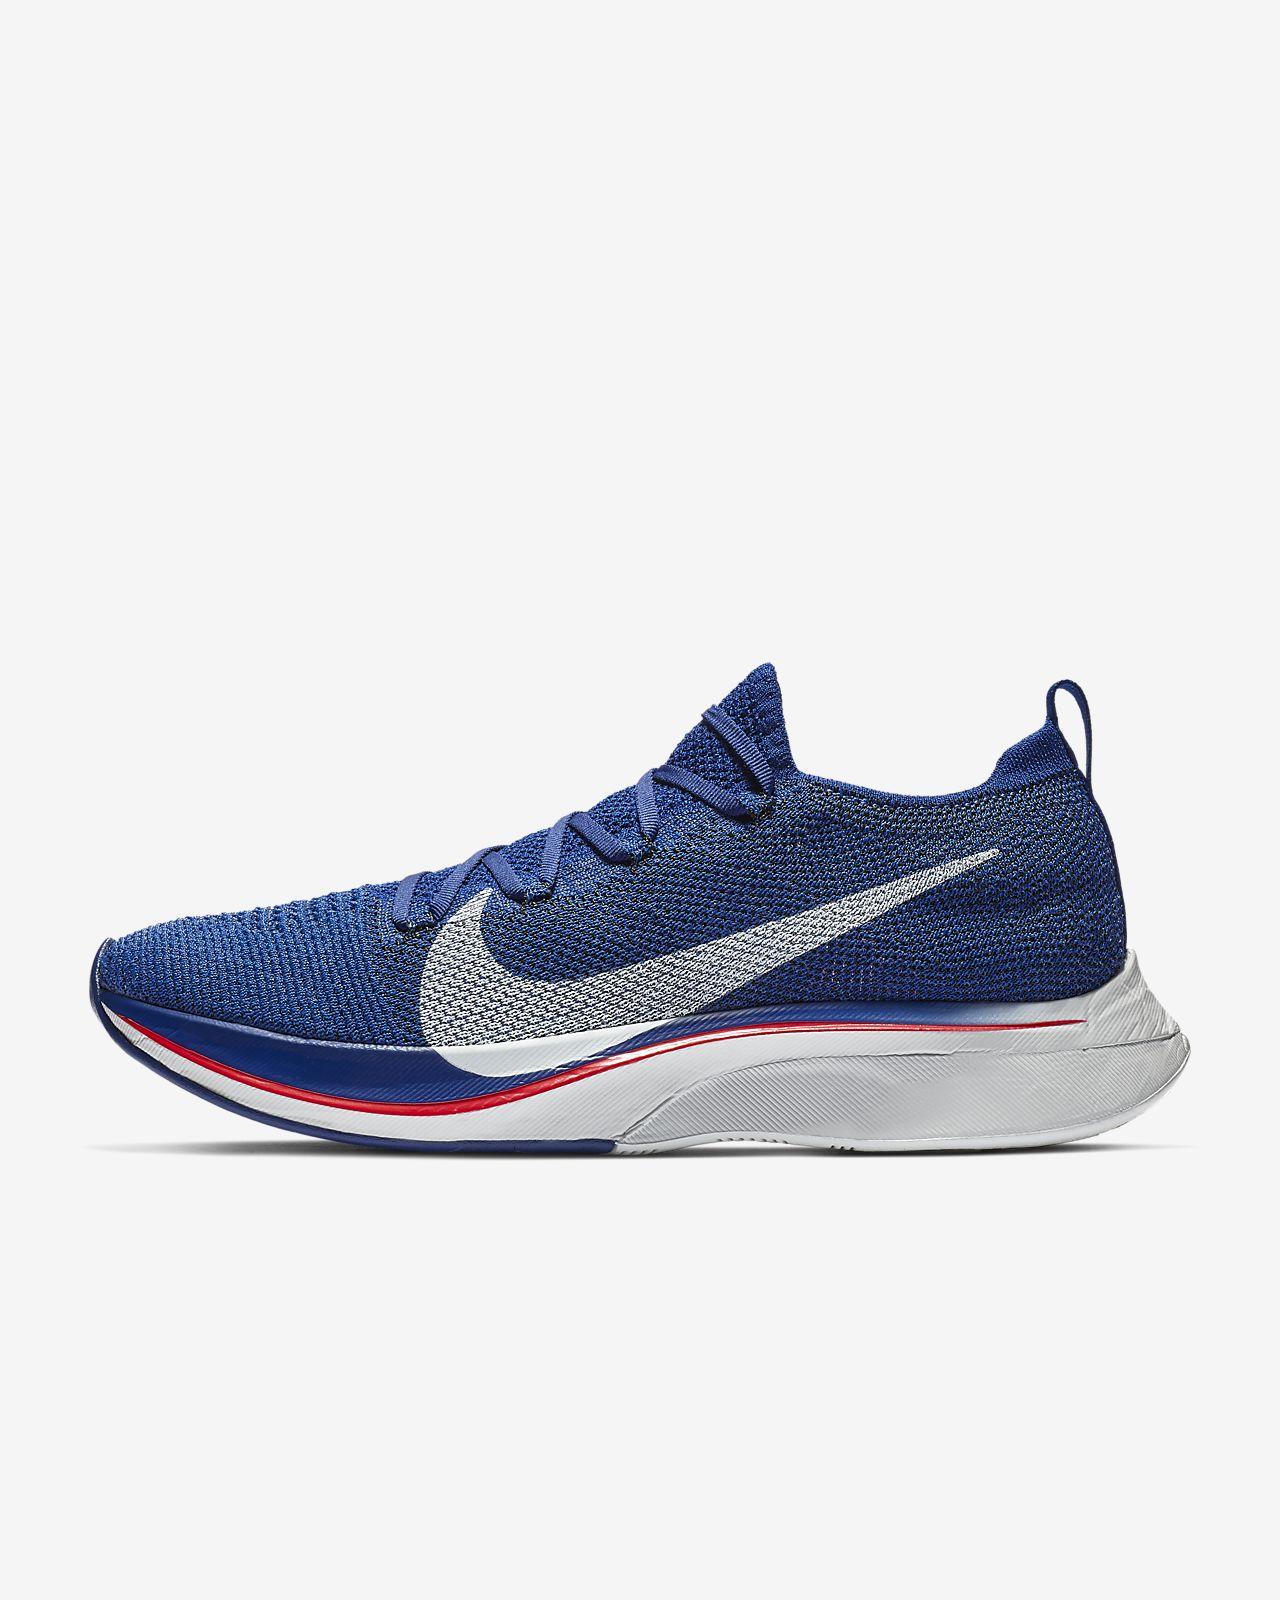 Chaussure de running Nike Vaporfly 4% Flyknit